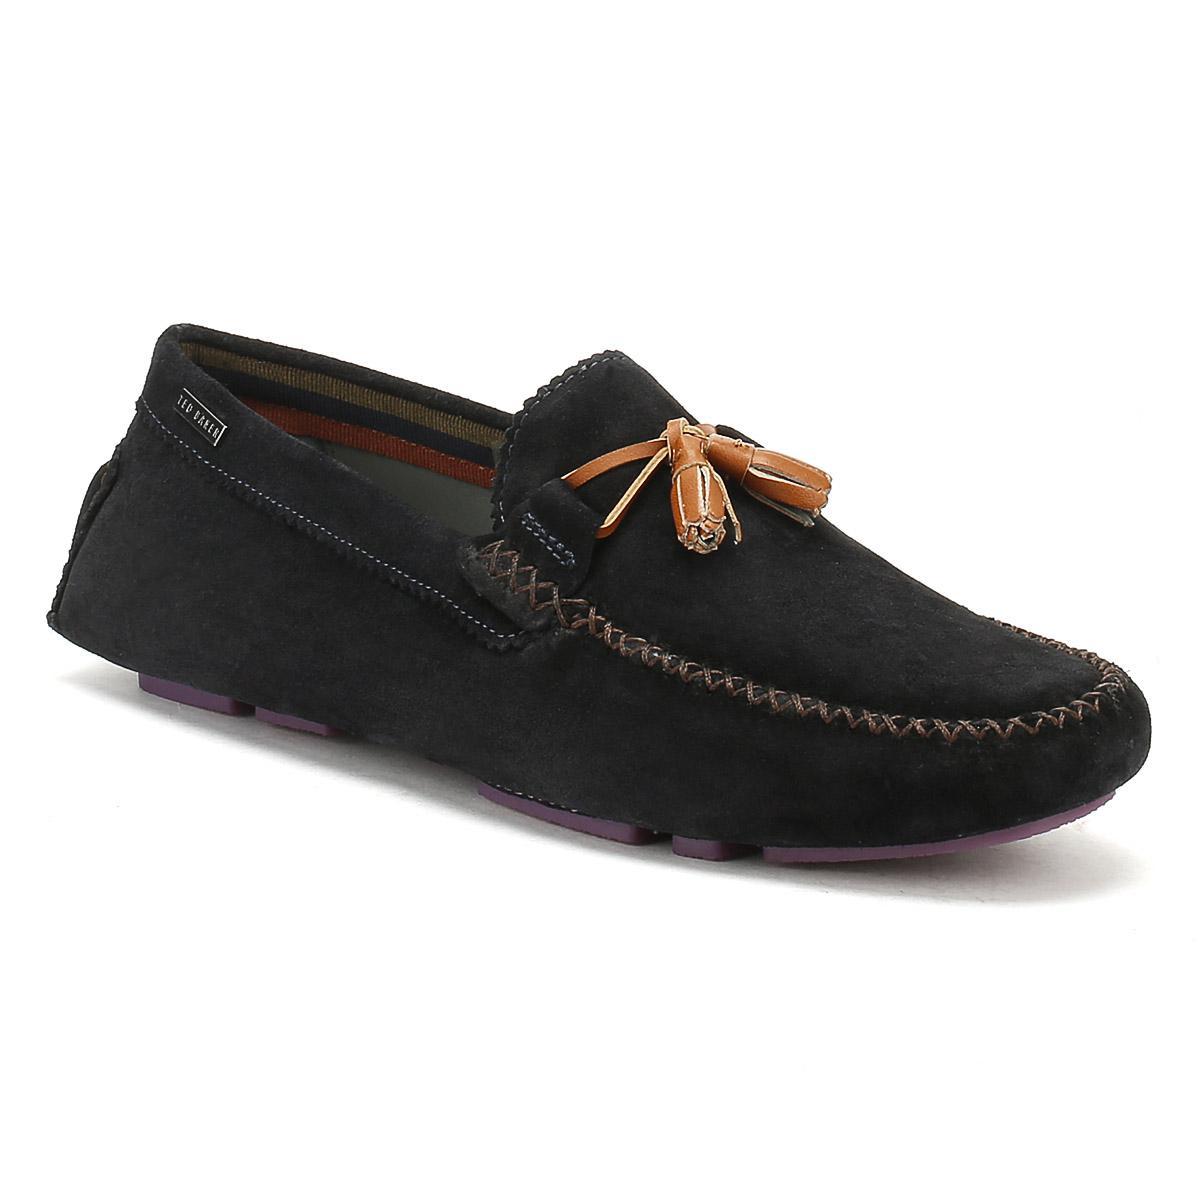 99761f6126e Ted Baker Mens Dark Blue Urbonn Suede Shoes in Blue for Men - Lyst